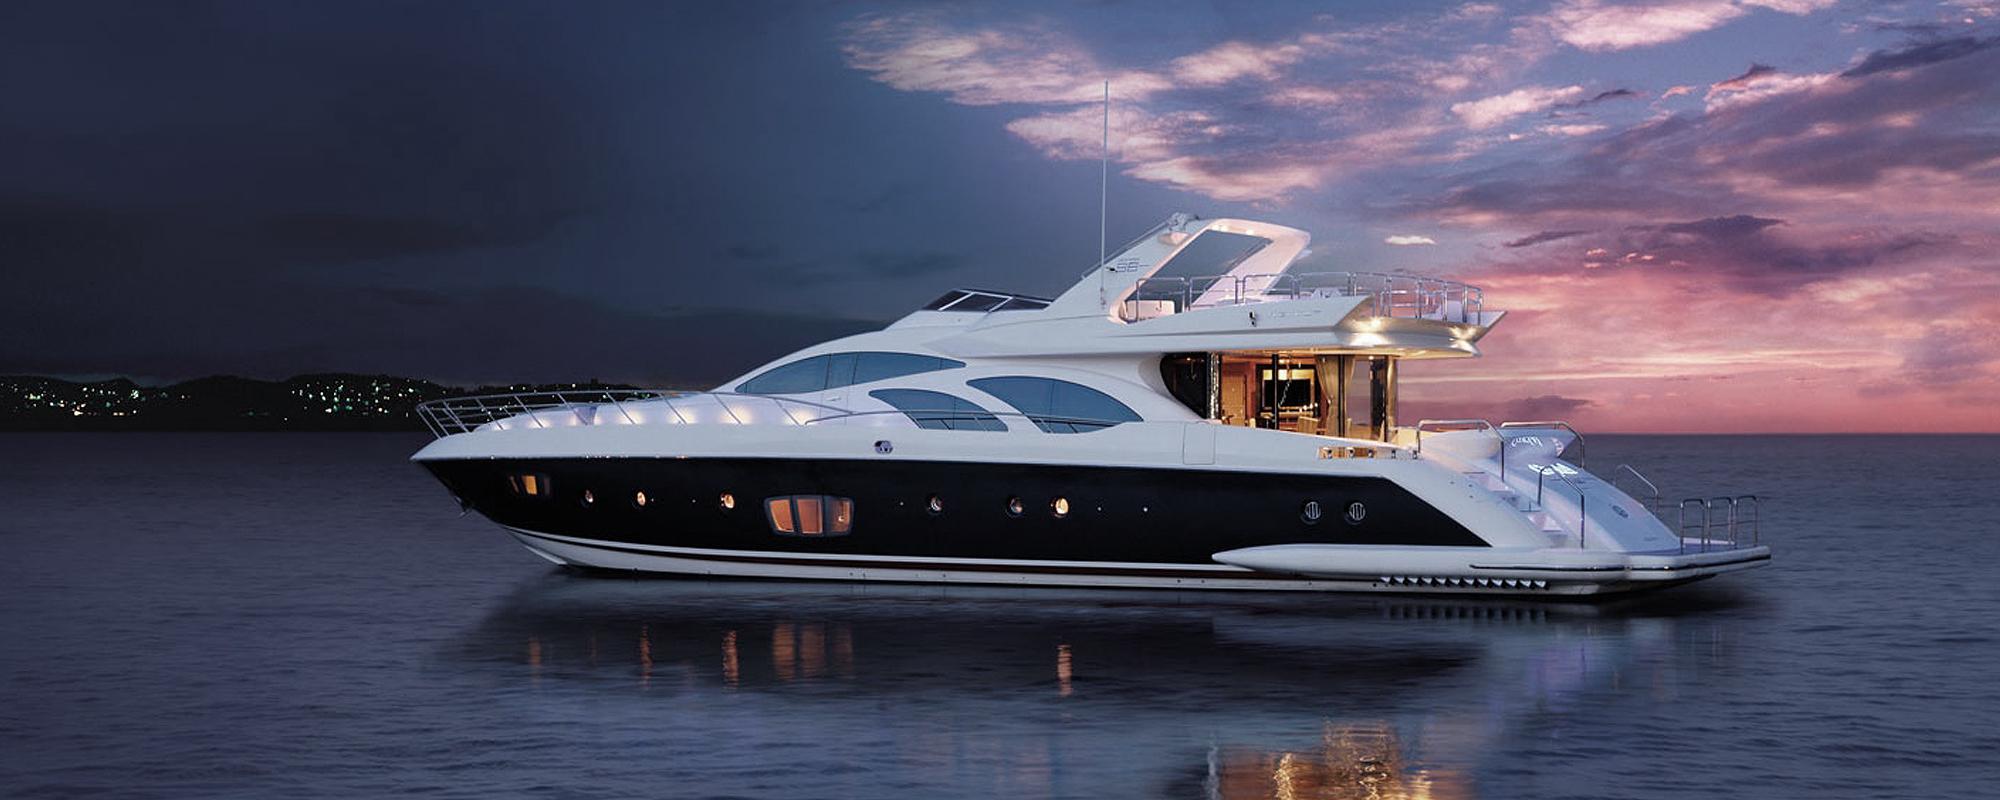 Honeymoon yachts for charter